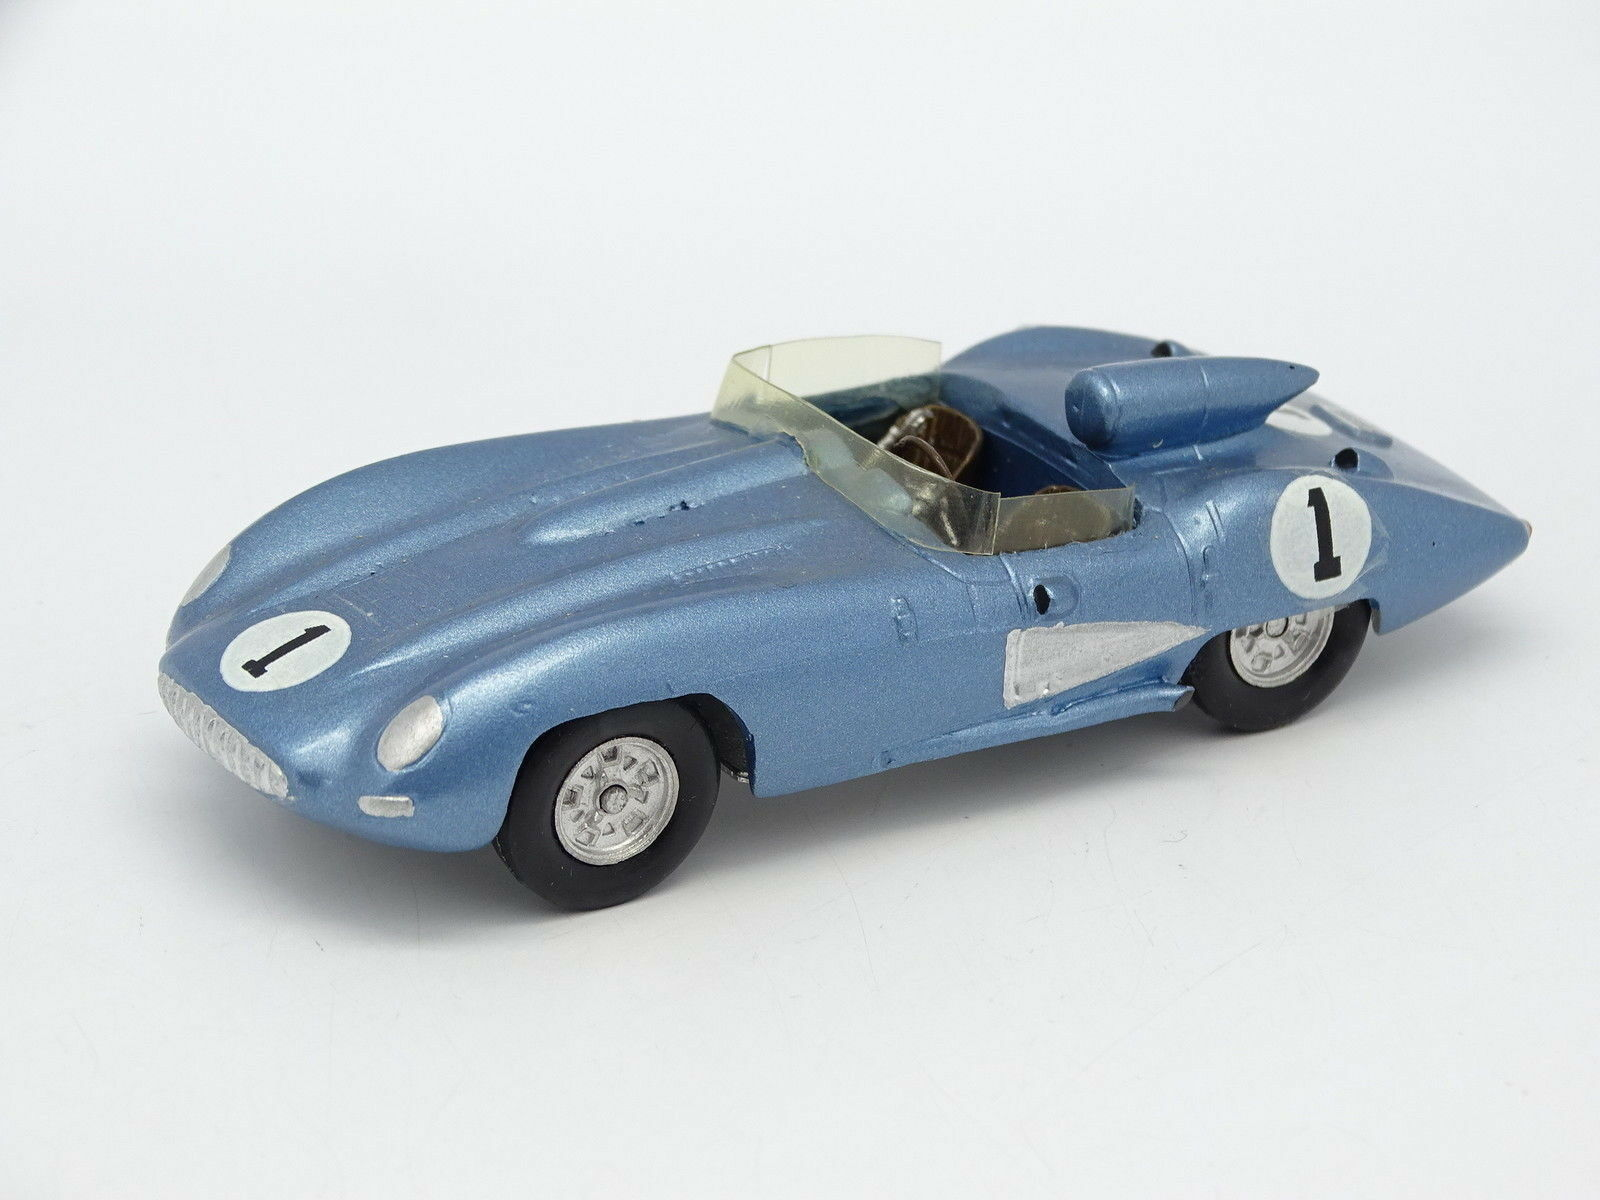 Classic Cars Kit Monté Métal 1 43 - Chevrolet Corvette SS Sebring 1957